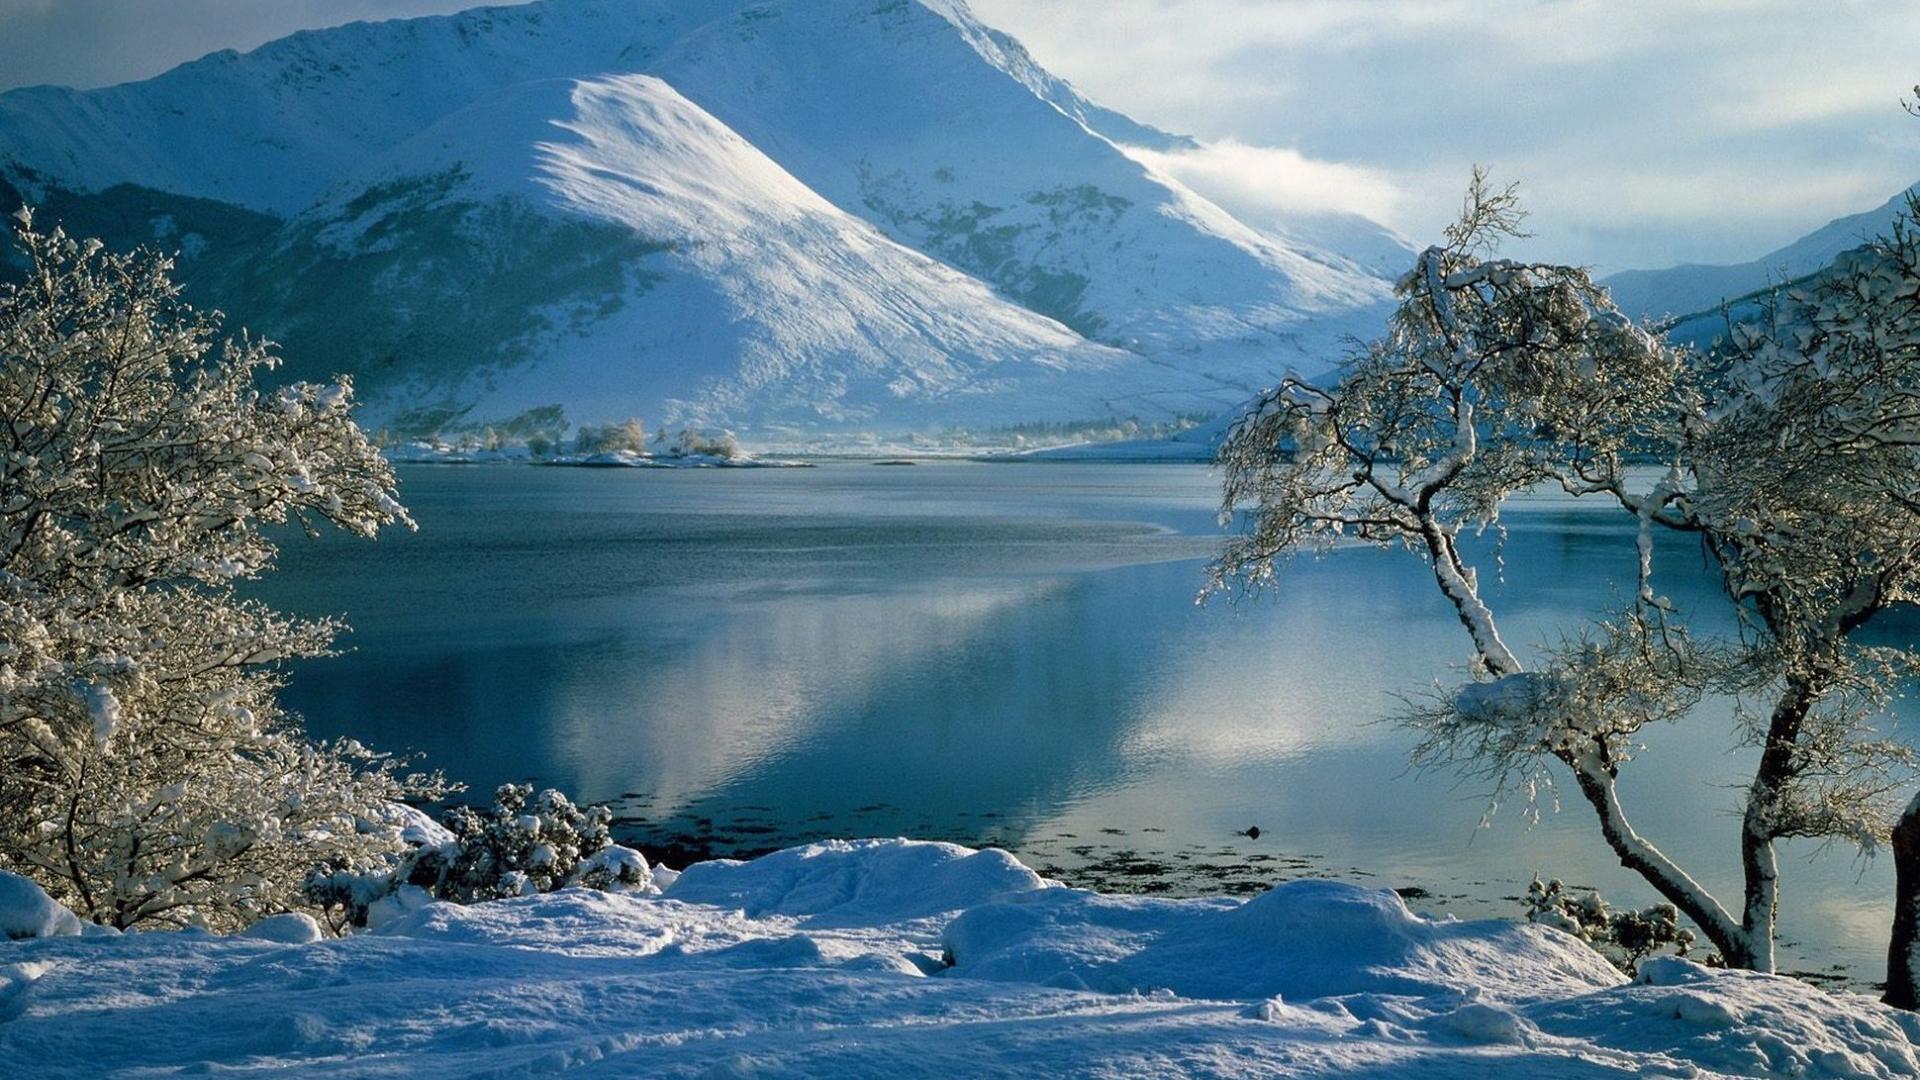 Snow Landscape Wallpaper Posted By Sarah Walker